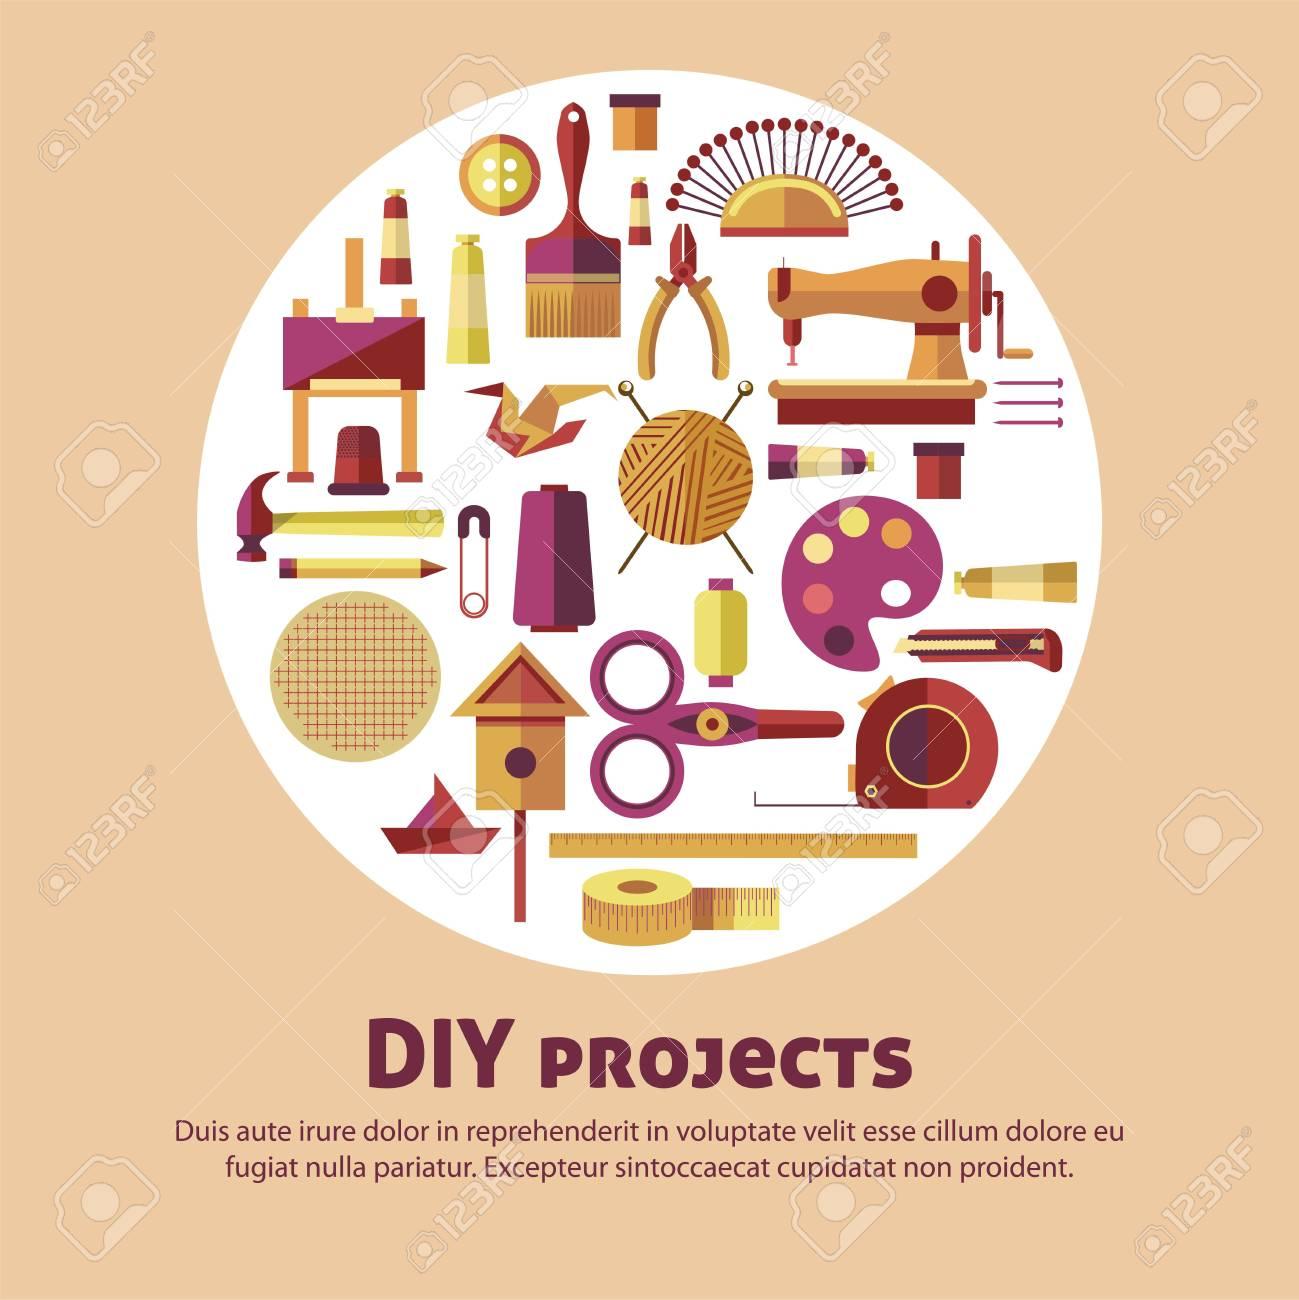 Creative Art Of Diy Projects Vector Poster For Kid Handicraft